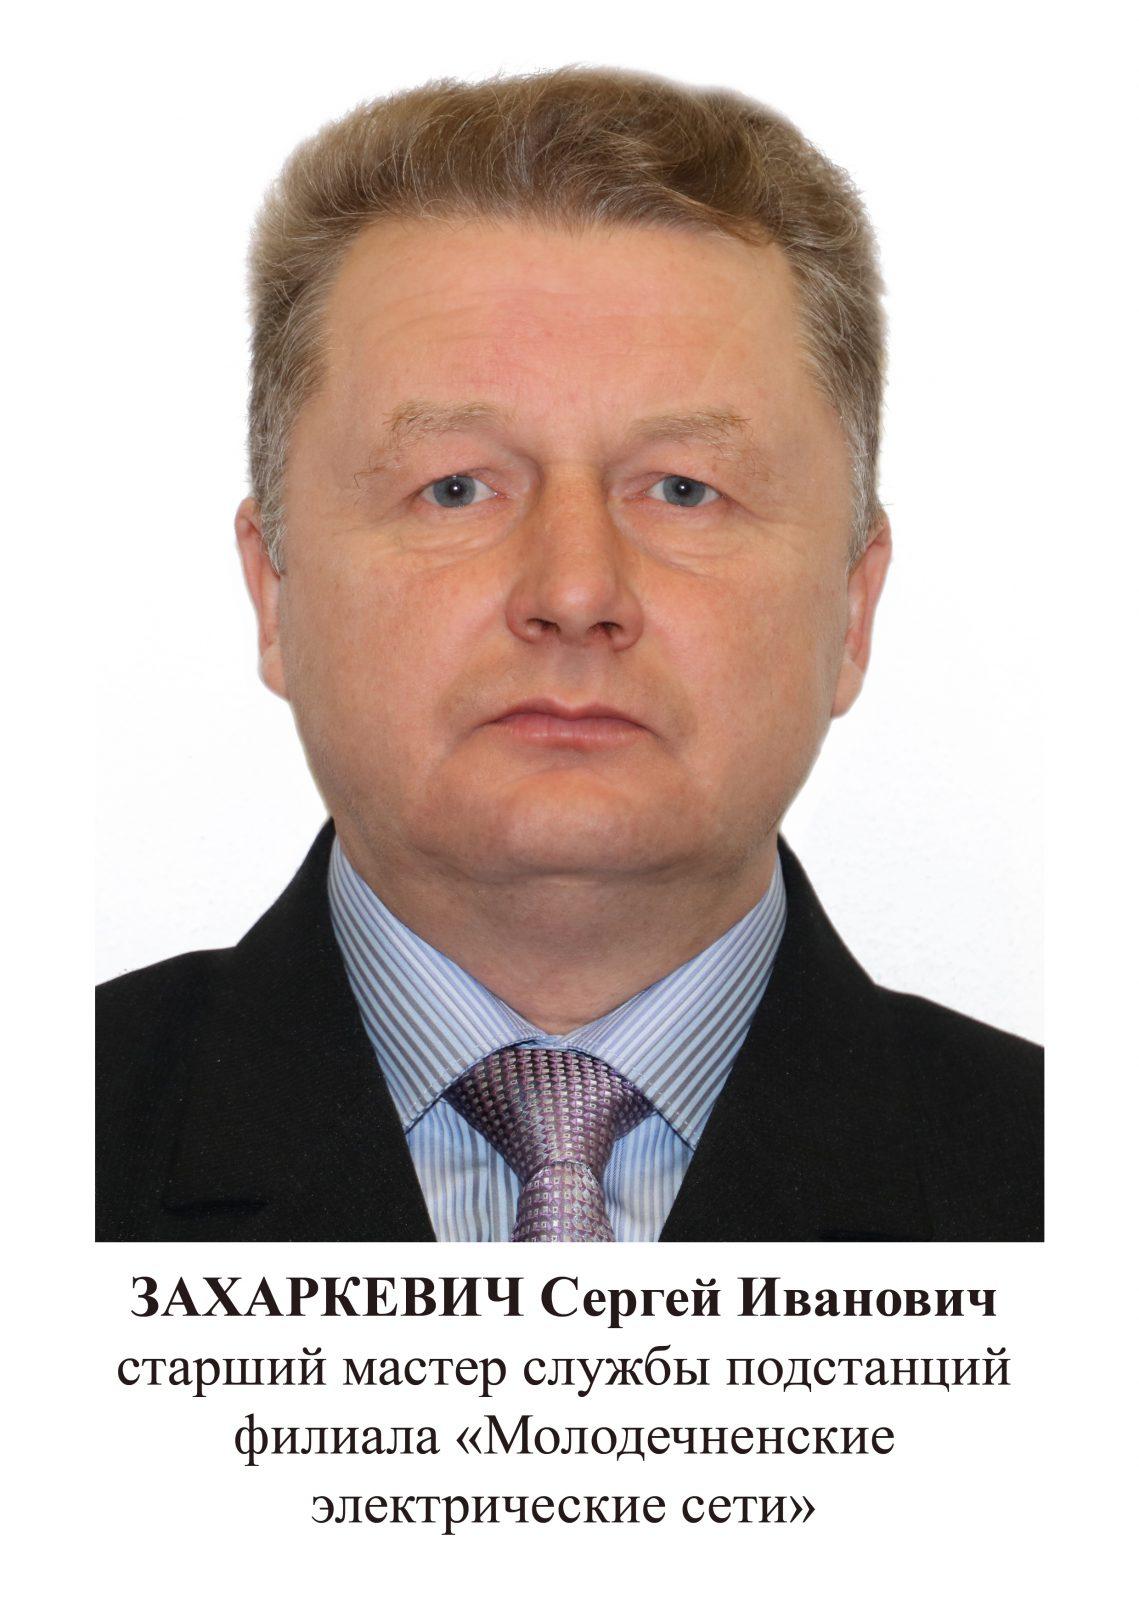 Захаркевич Сергей Иванович